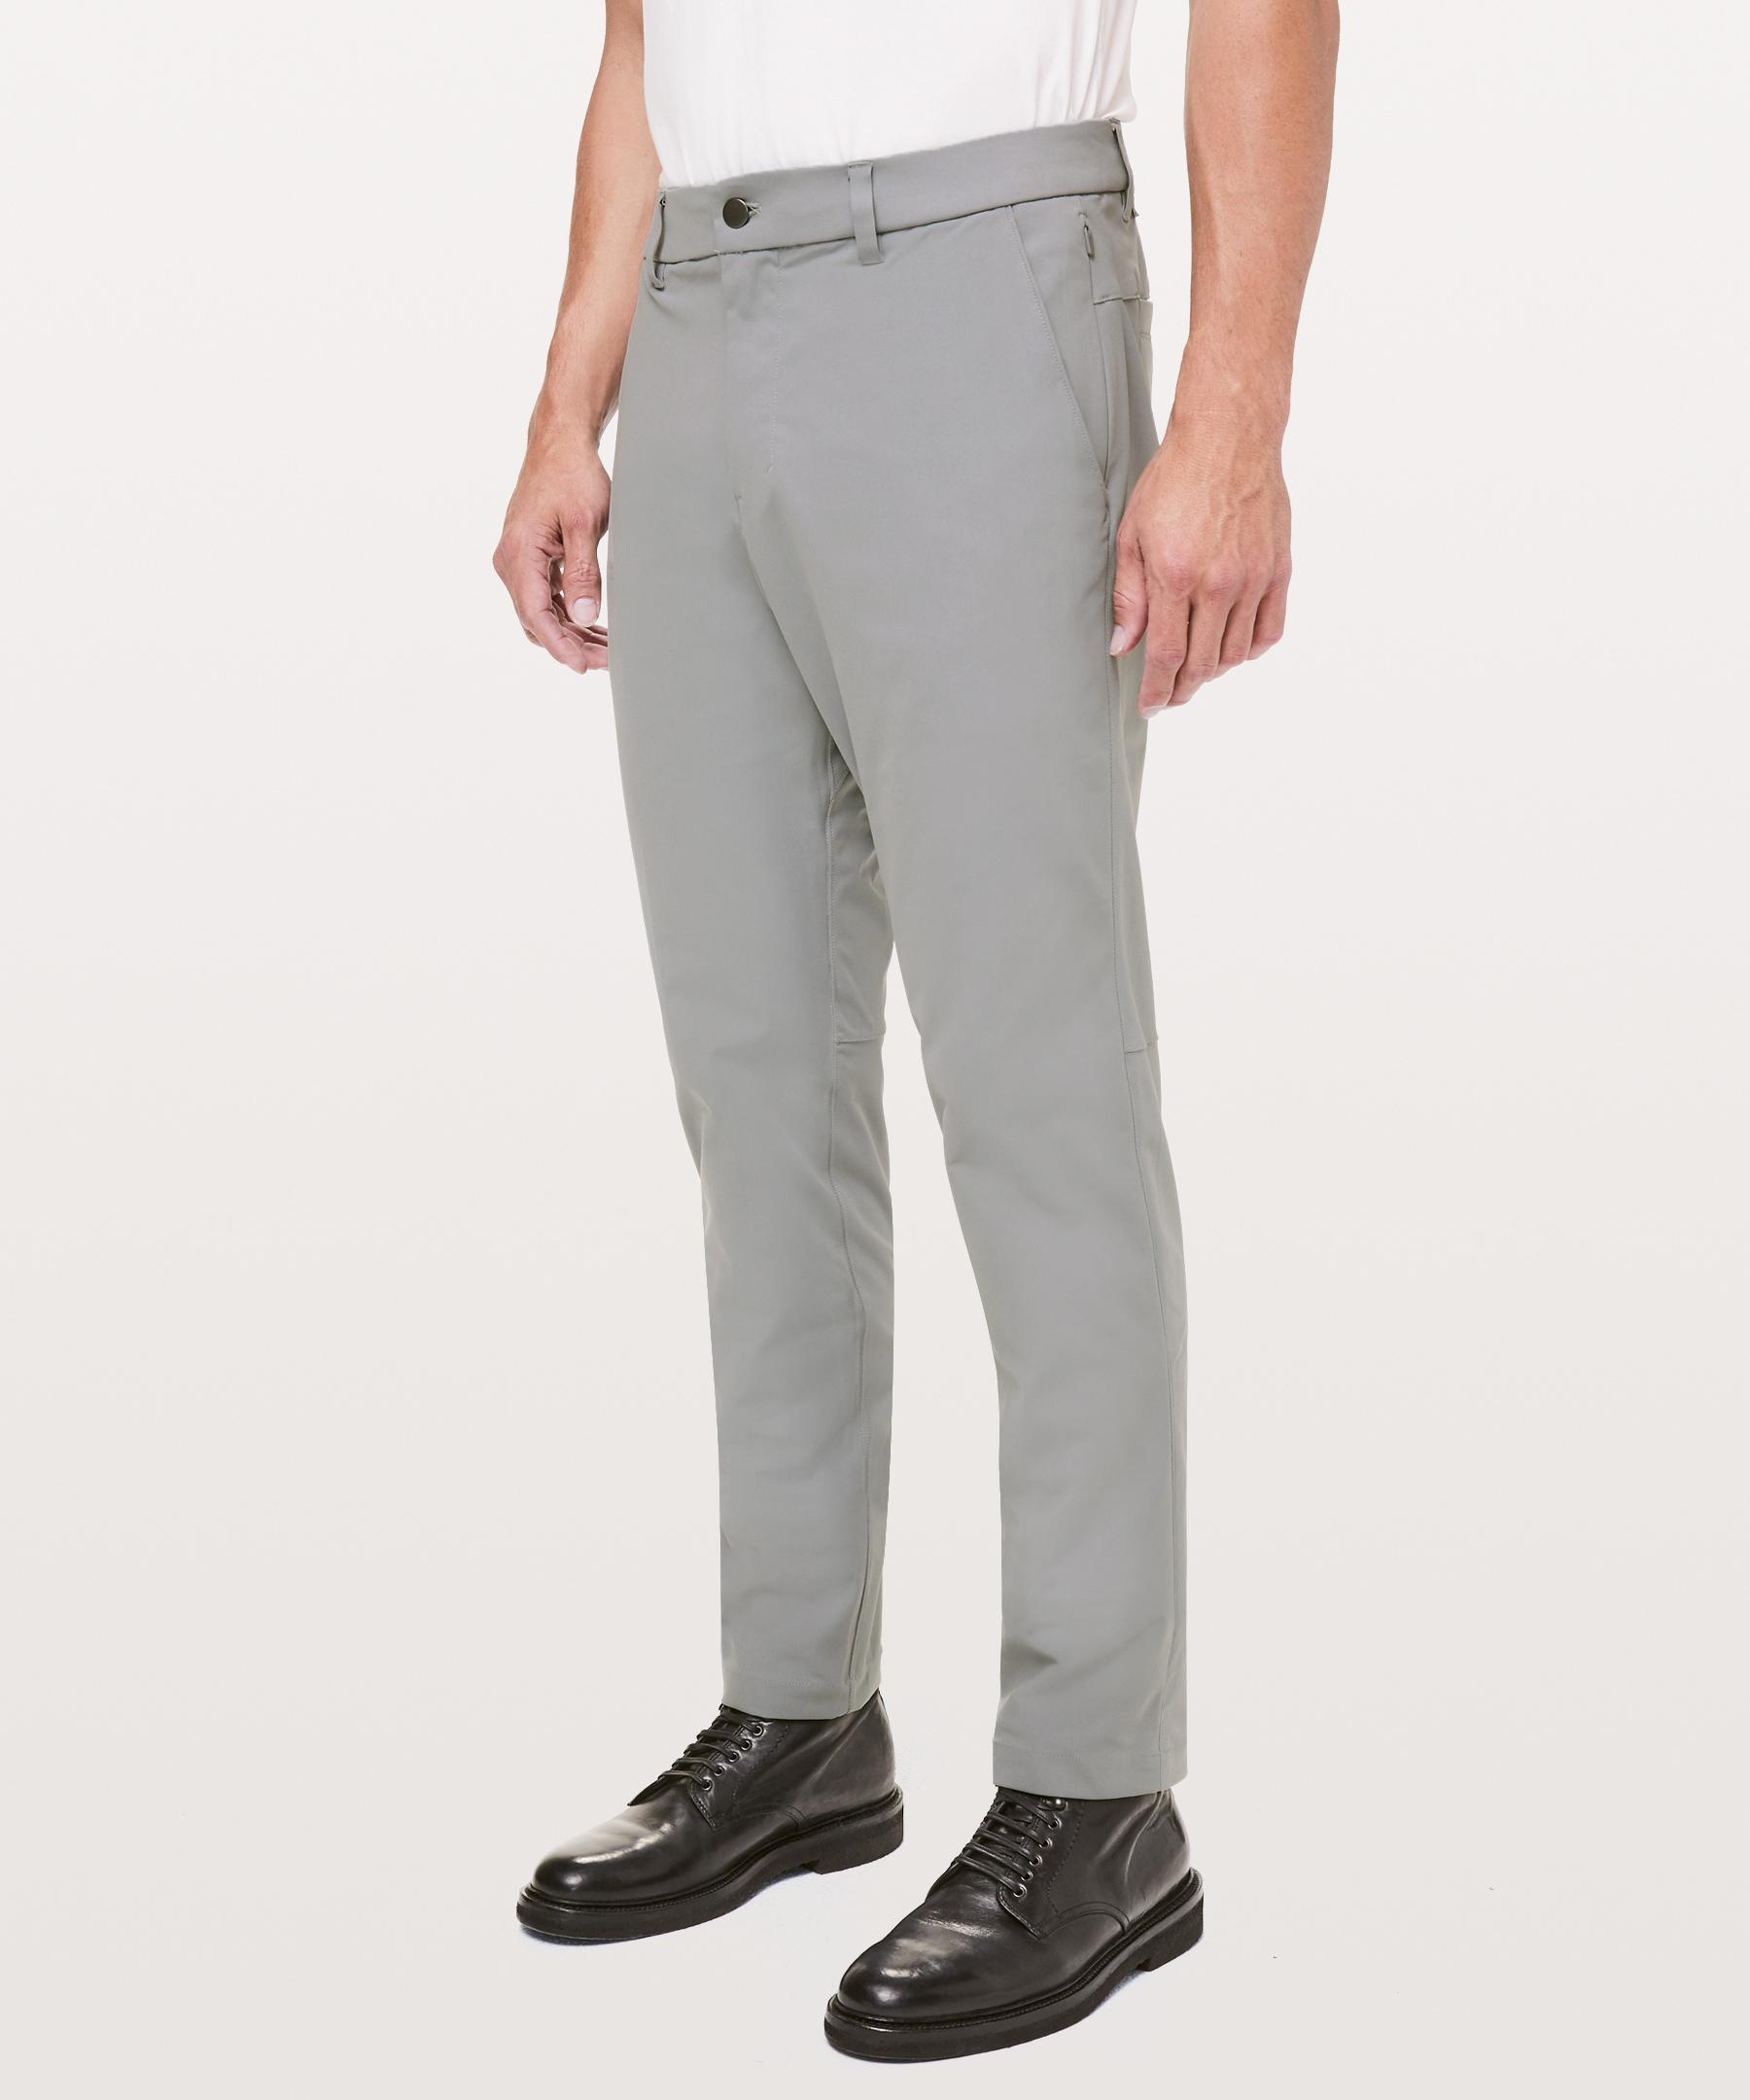 921928049e8 lululemon Men's Commission Pant Relaxed Online Only 34